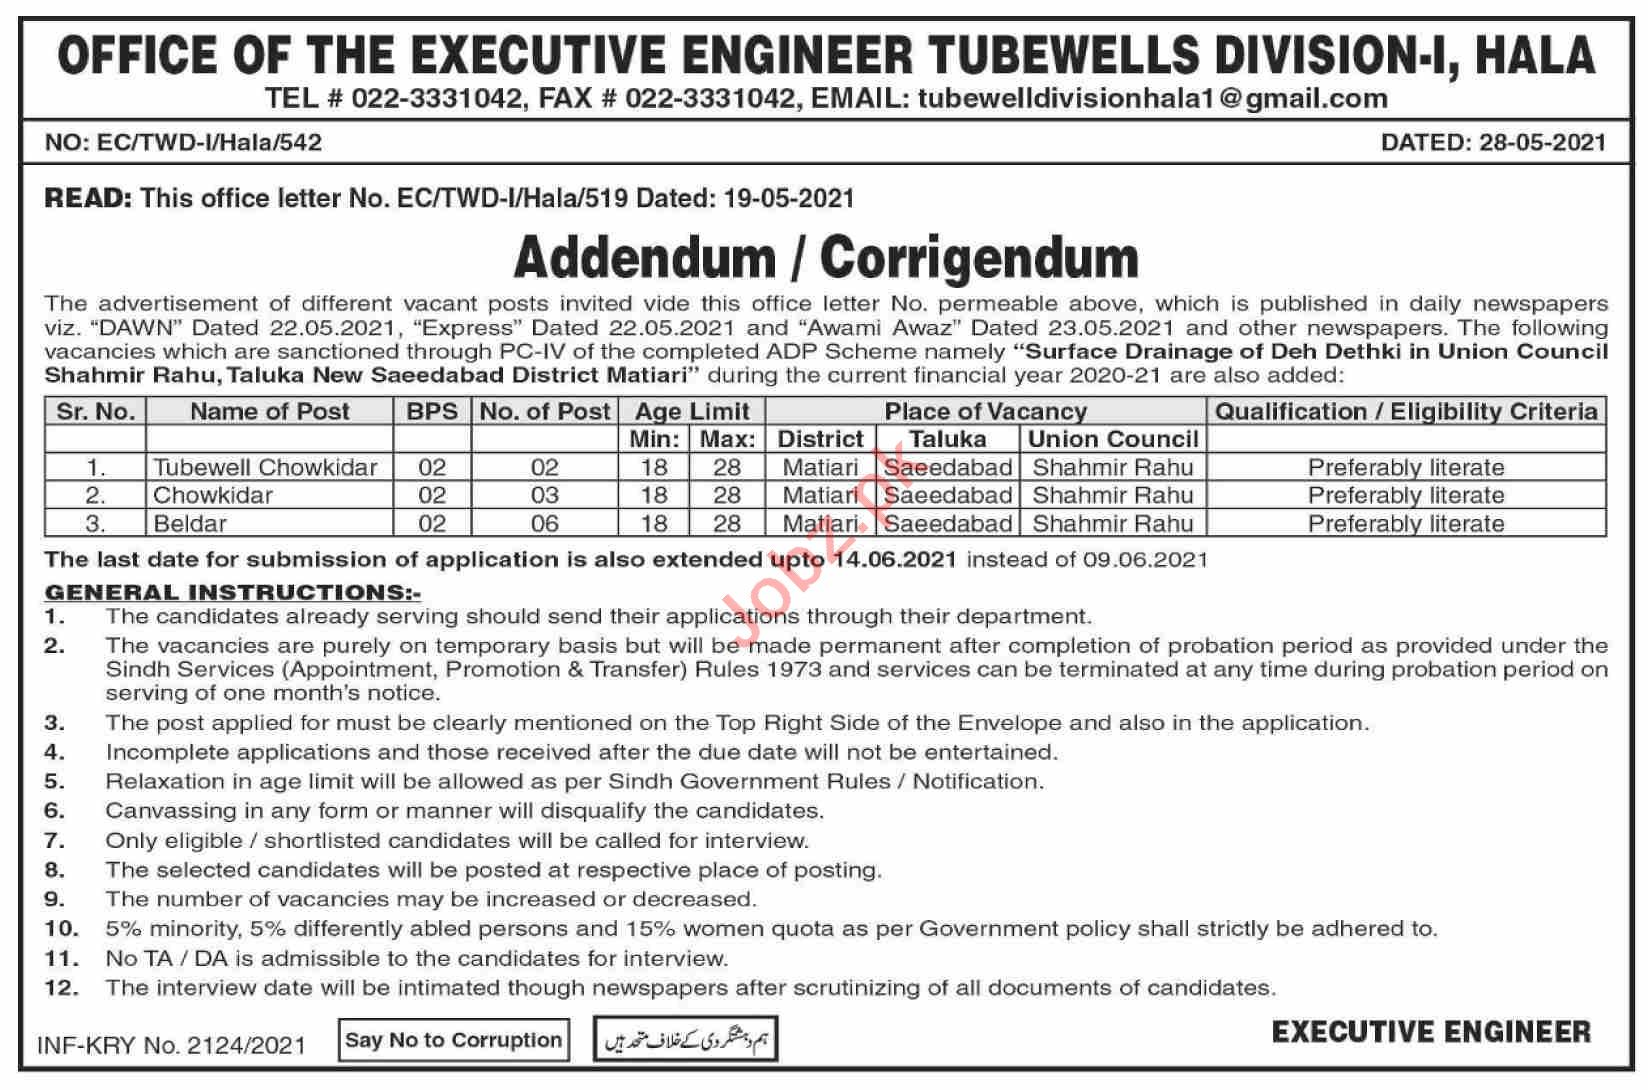 Tube Wells Division Hala 1 Jobs 2021 for Chowkidar & Beldar